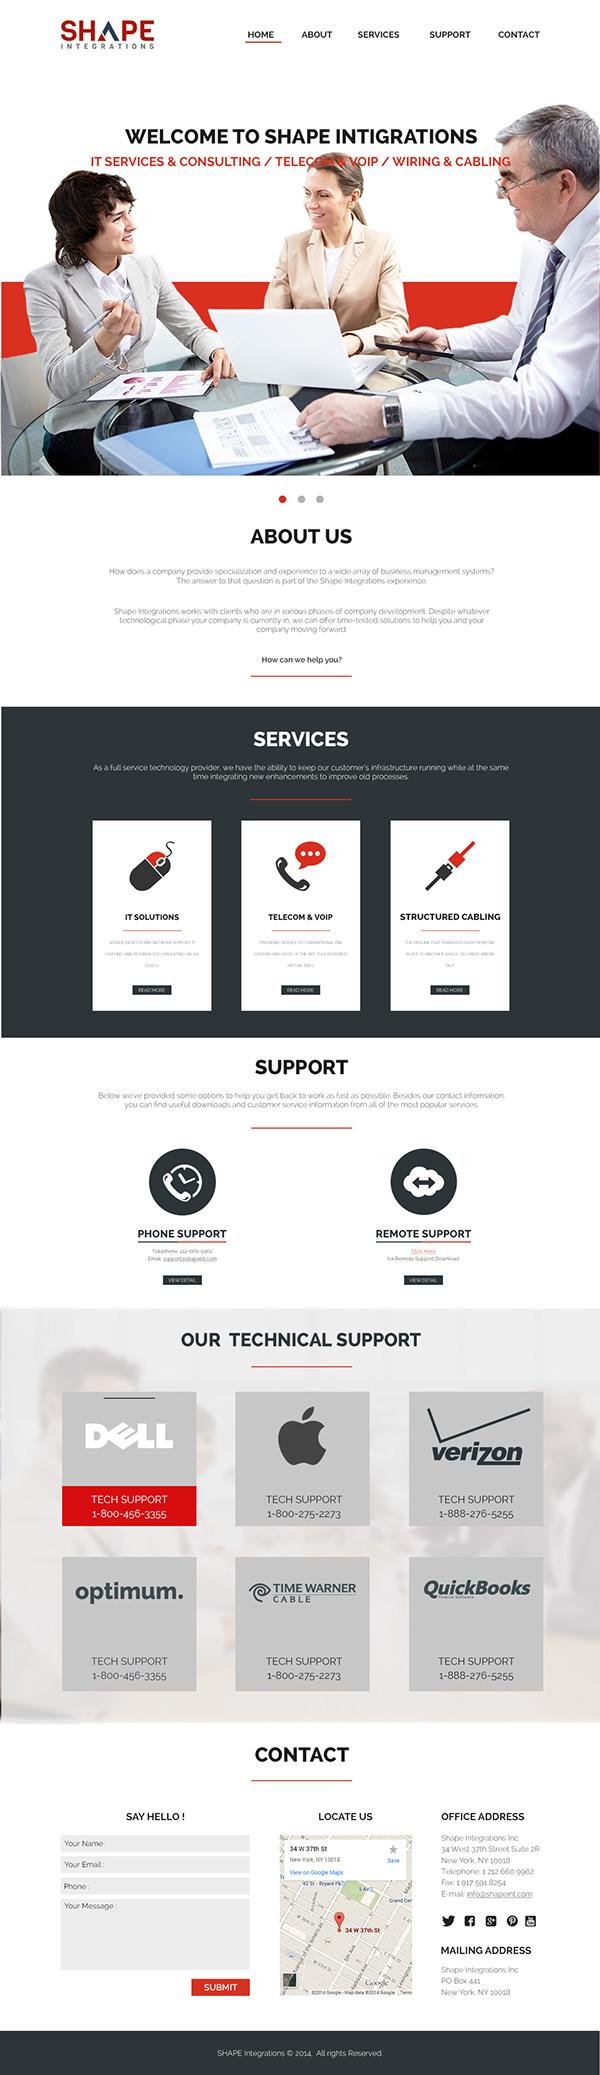 Website Design #2 on #Behance #website #design #photoshop #psd #one #page #bootstrap #grid